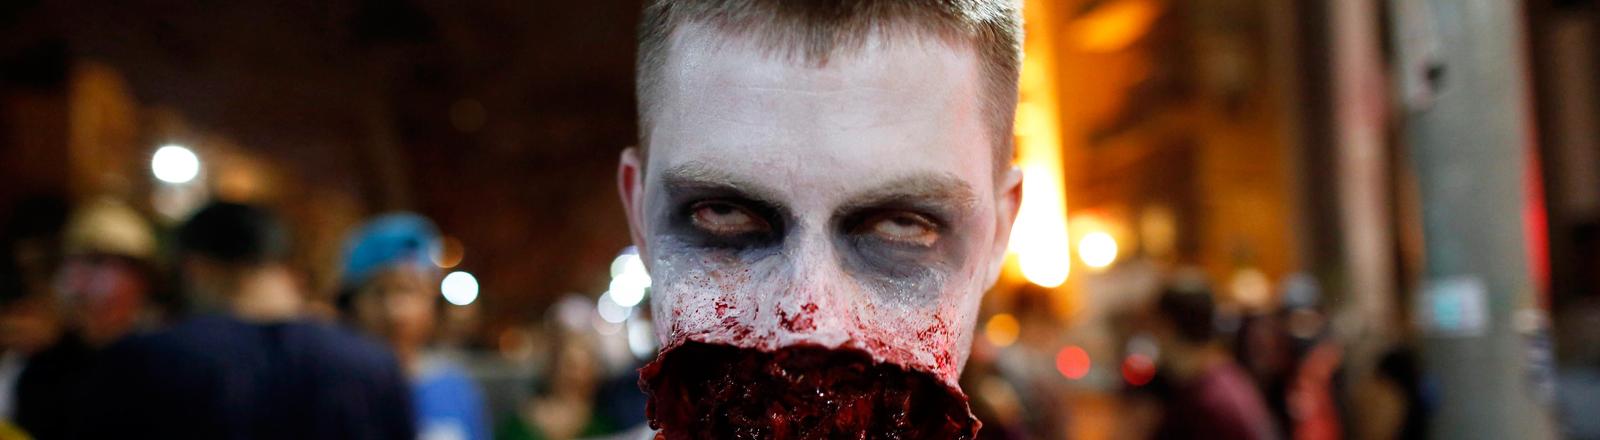 Zombie bei Nacht